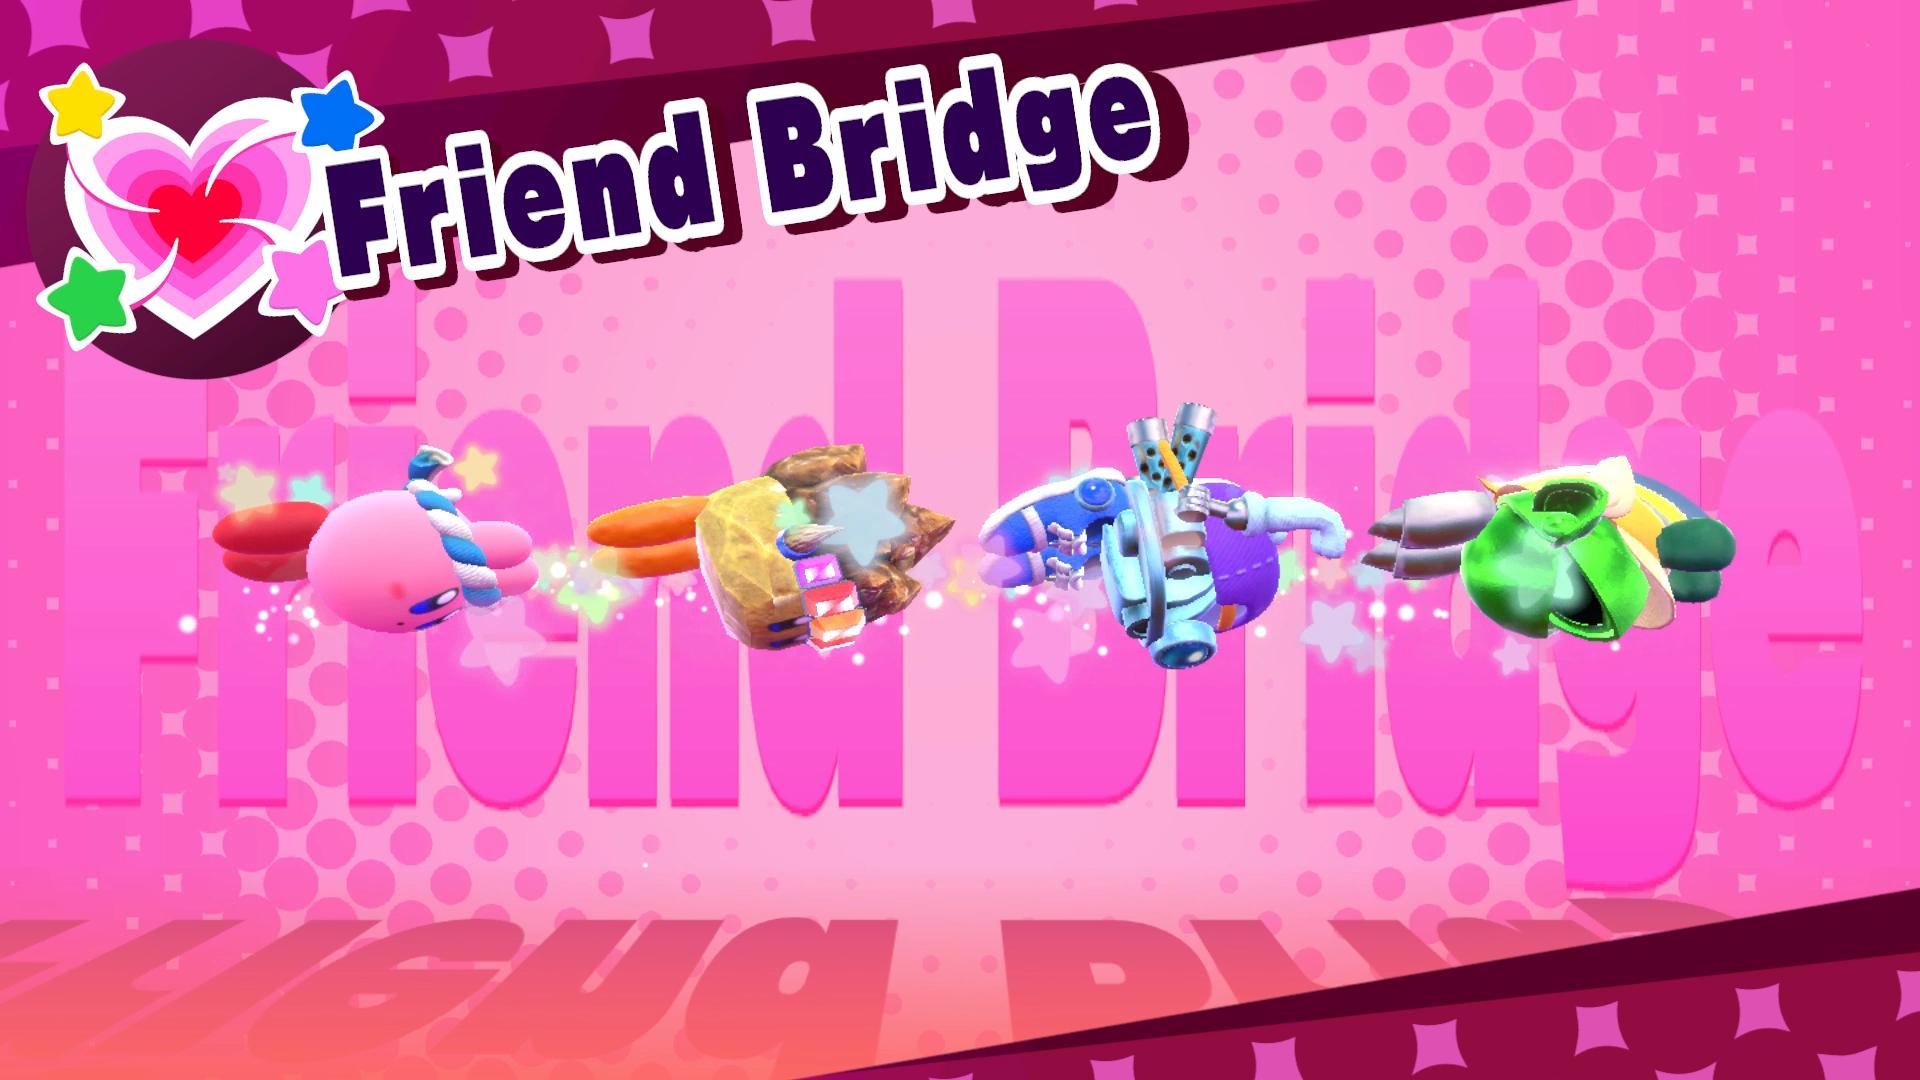 Friend Bridge